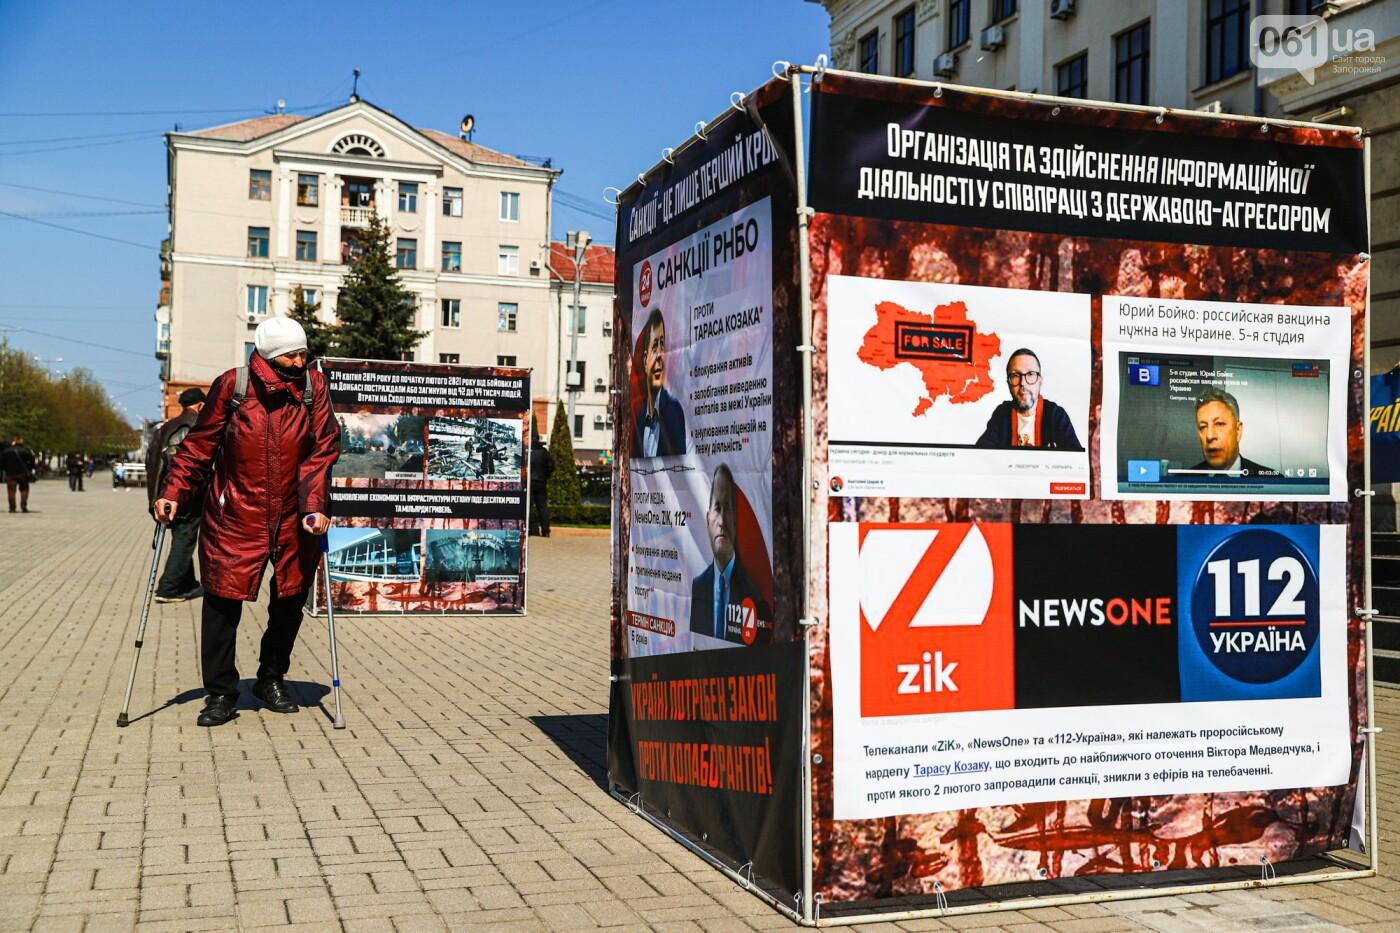 В Запорожье возле мэрии установили стенды с портретами Медведчука и Шария, - ФОТО, фото-13